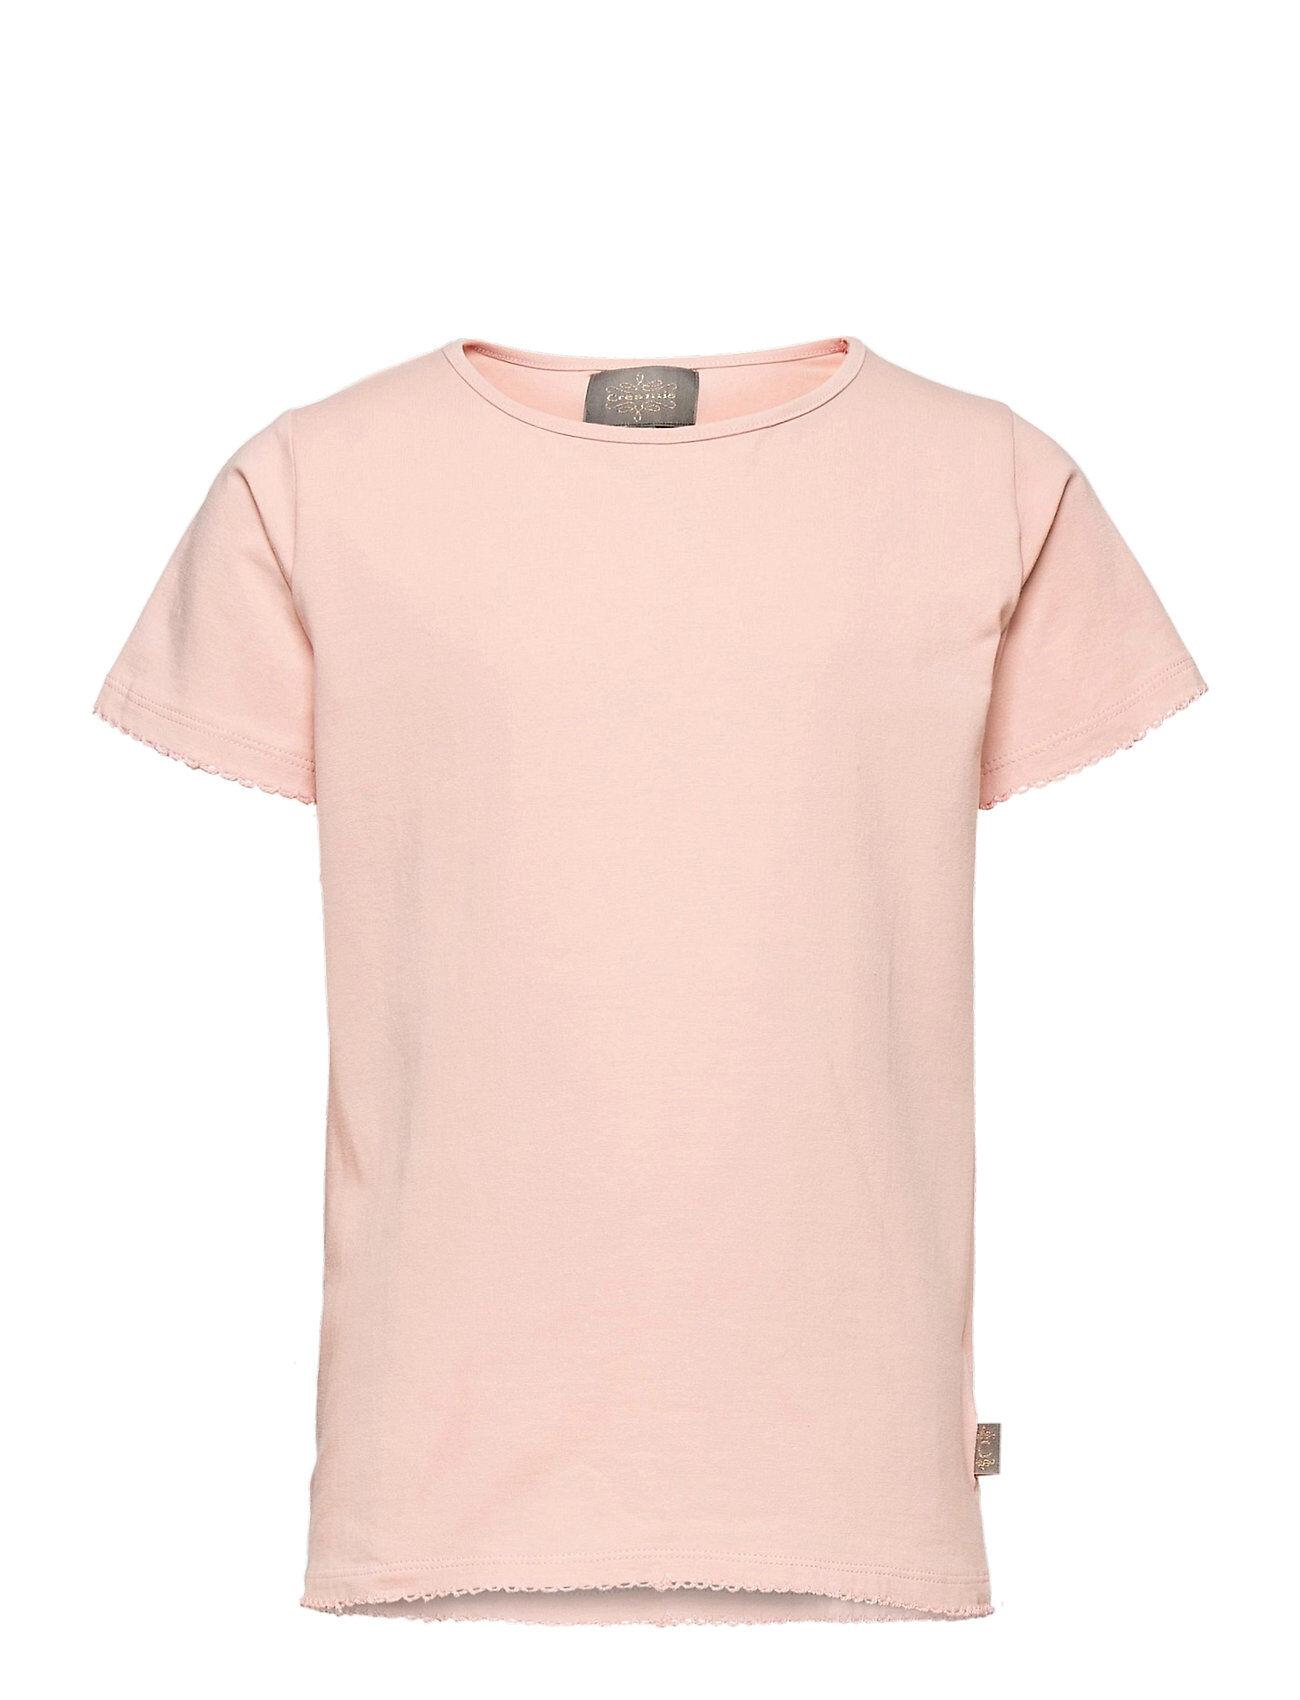 Creamie T-Shirt Ss T-shirts Short-sleeved Vaaleanpunainen Creamie